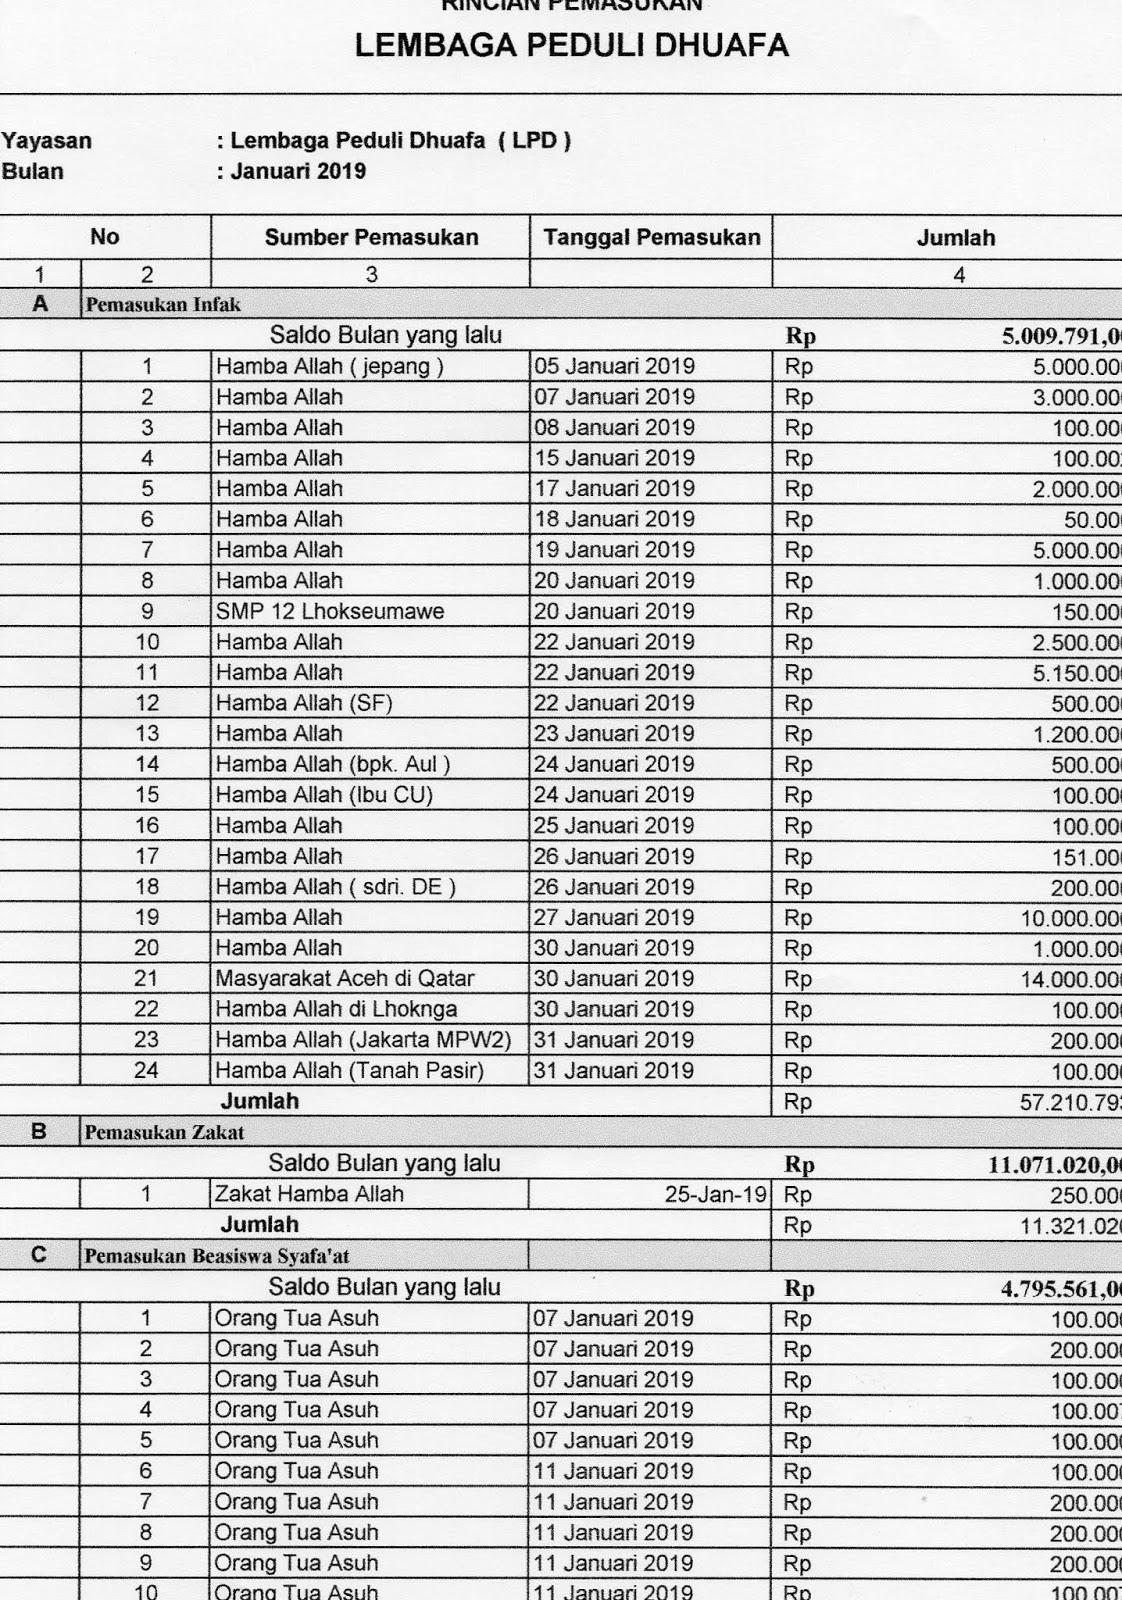 Laporan Kegiatan, Pemasukan dan Pengeluaran  Lembaga Peduli Dhuafa Bulan Januari 2019